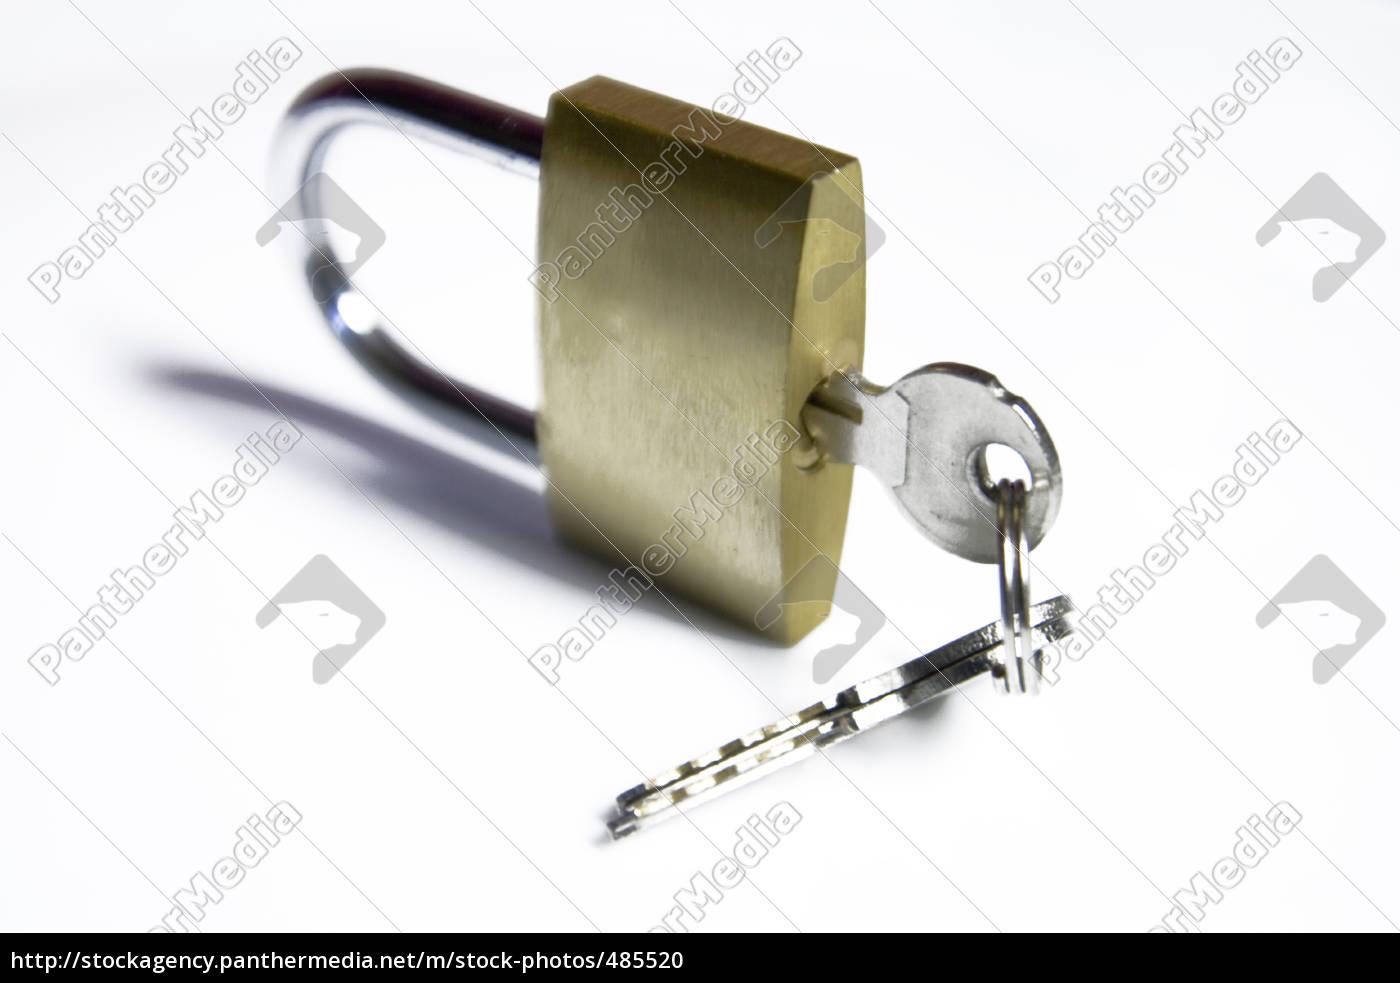 padlock - 485520